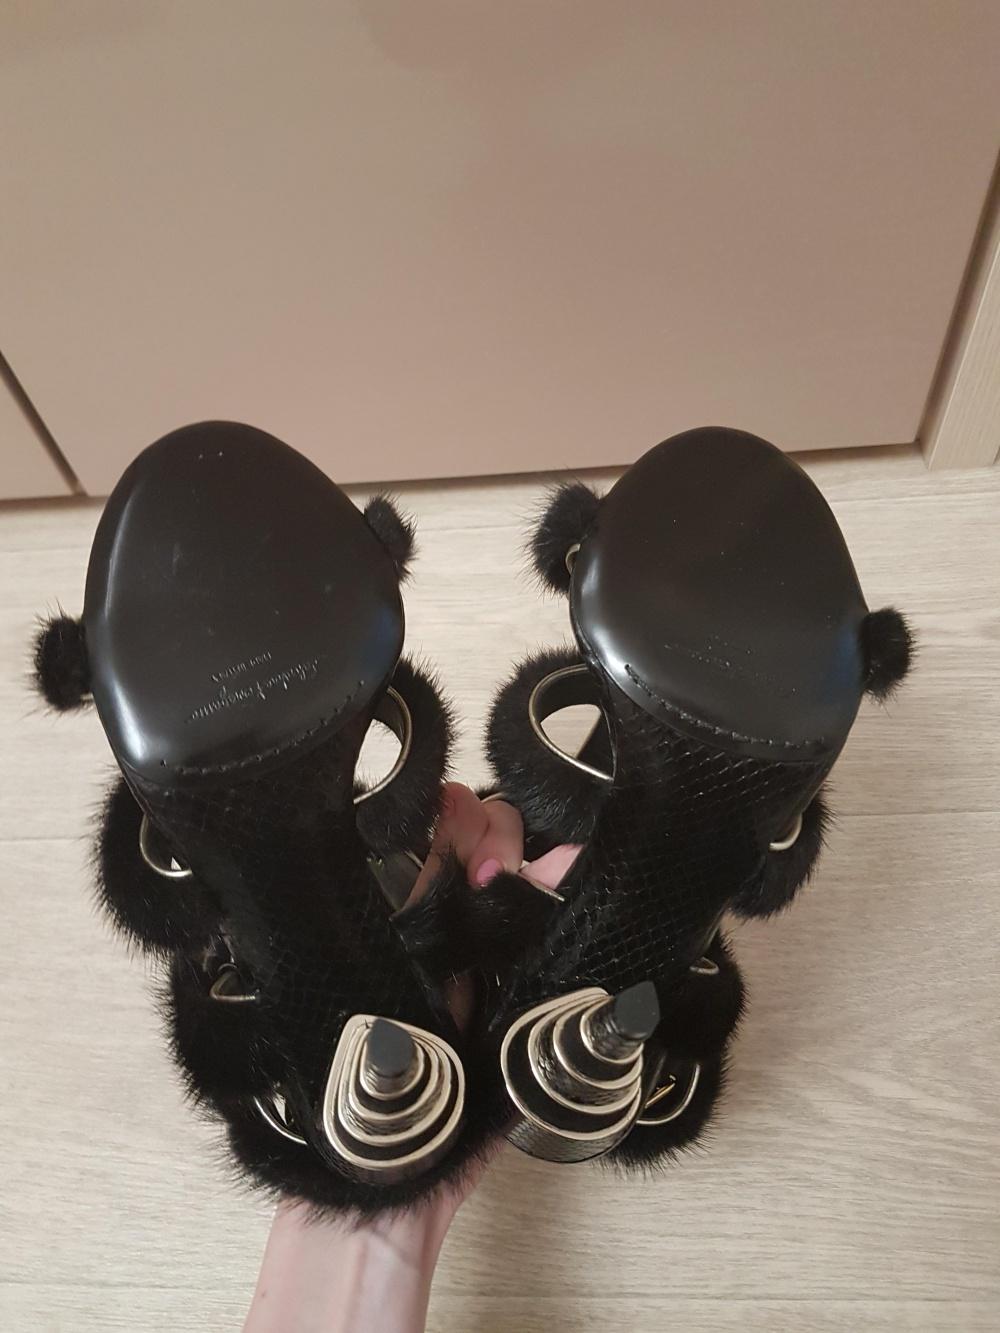 Босоножки Salvatore Ferragamo из кожи питона и меха норки, размер 37